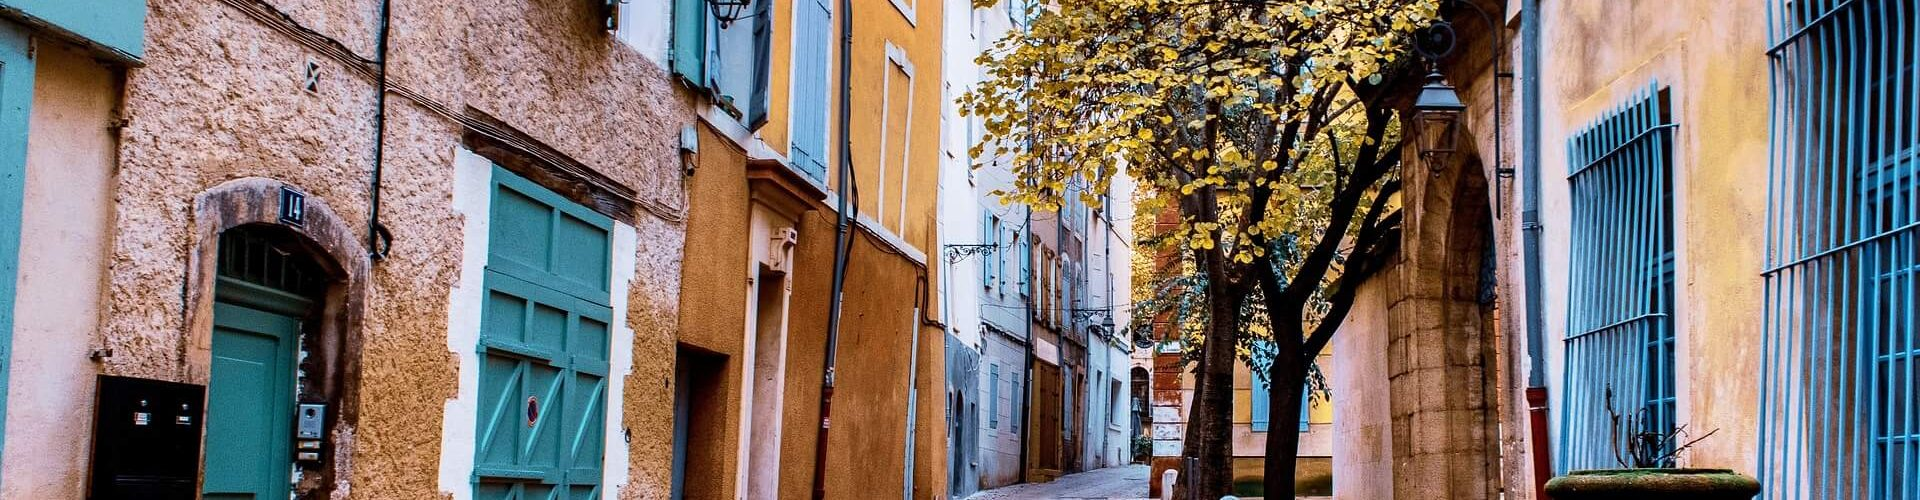 provence-street